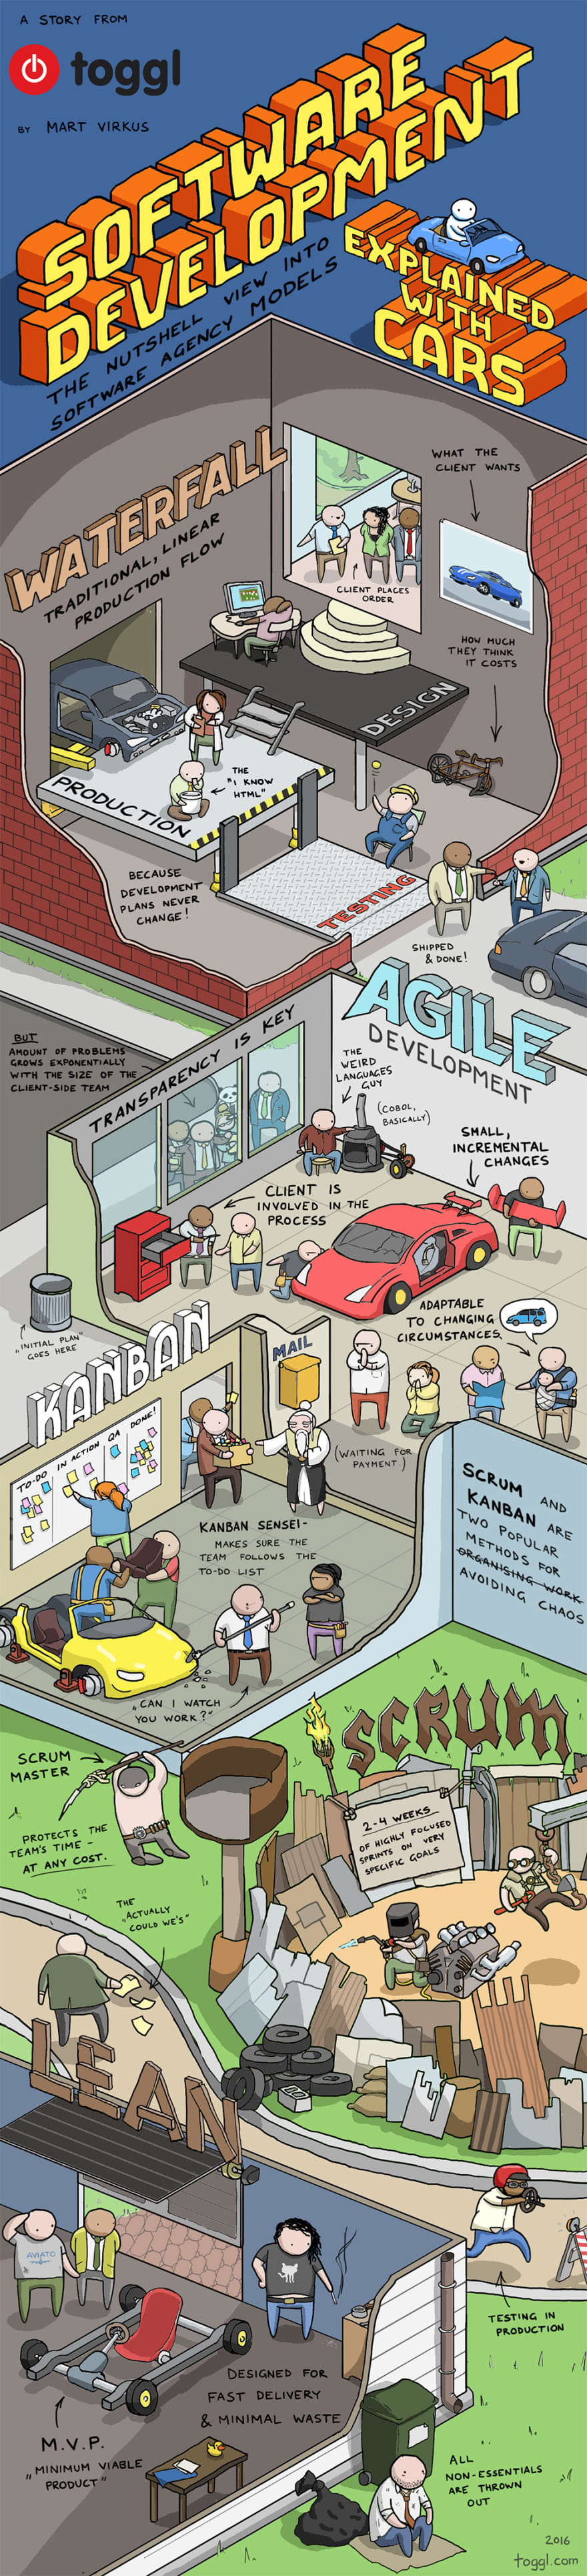 Image For Post | https://toggl.com/developer-methods-infographic/